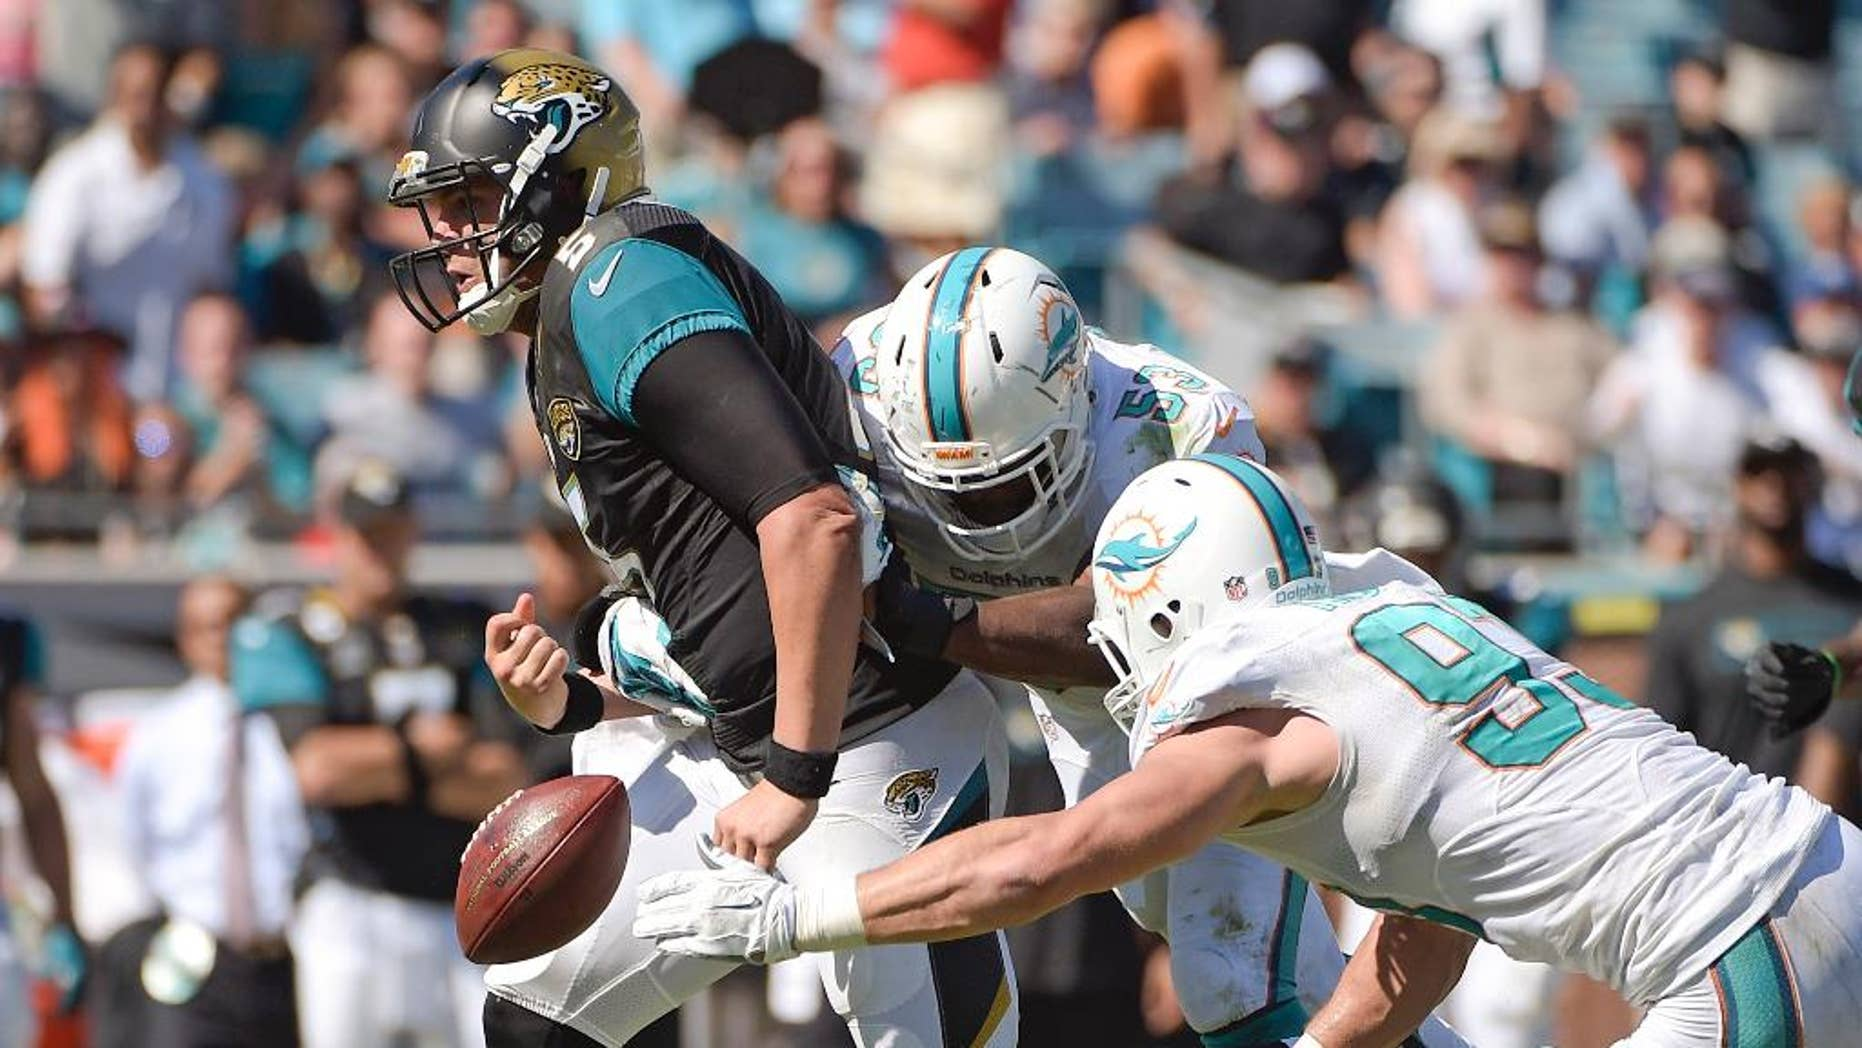 Jacksonville Jaguars quarterback Blake Bortles, left, fumbles the ball as he is hit by Miami Dolphins middle linebacker Jason Trusnik, right, and linebacker John Lotulelei, center, during the first half of an NFL football game in Jacksonville, Fla., Sunday, Oct. 26, 2014. (AP Photo/Phelan M. Ebenhack)